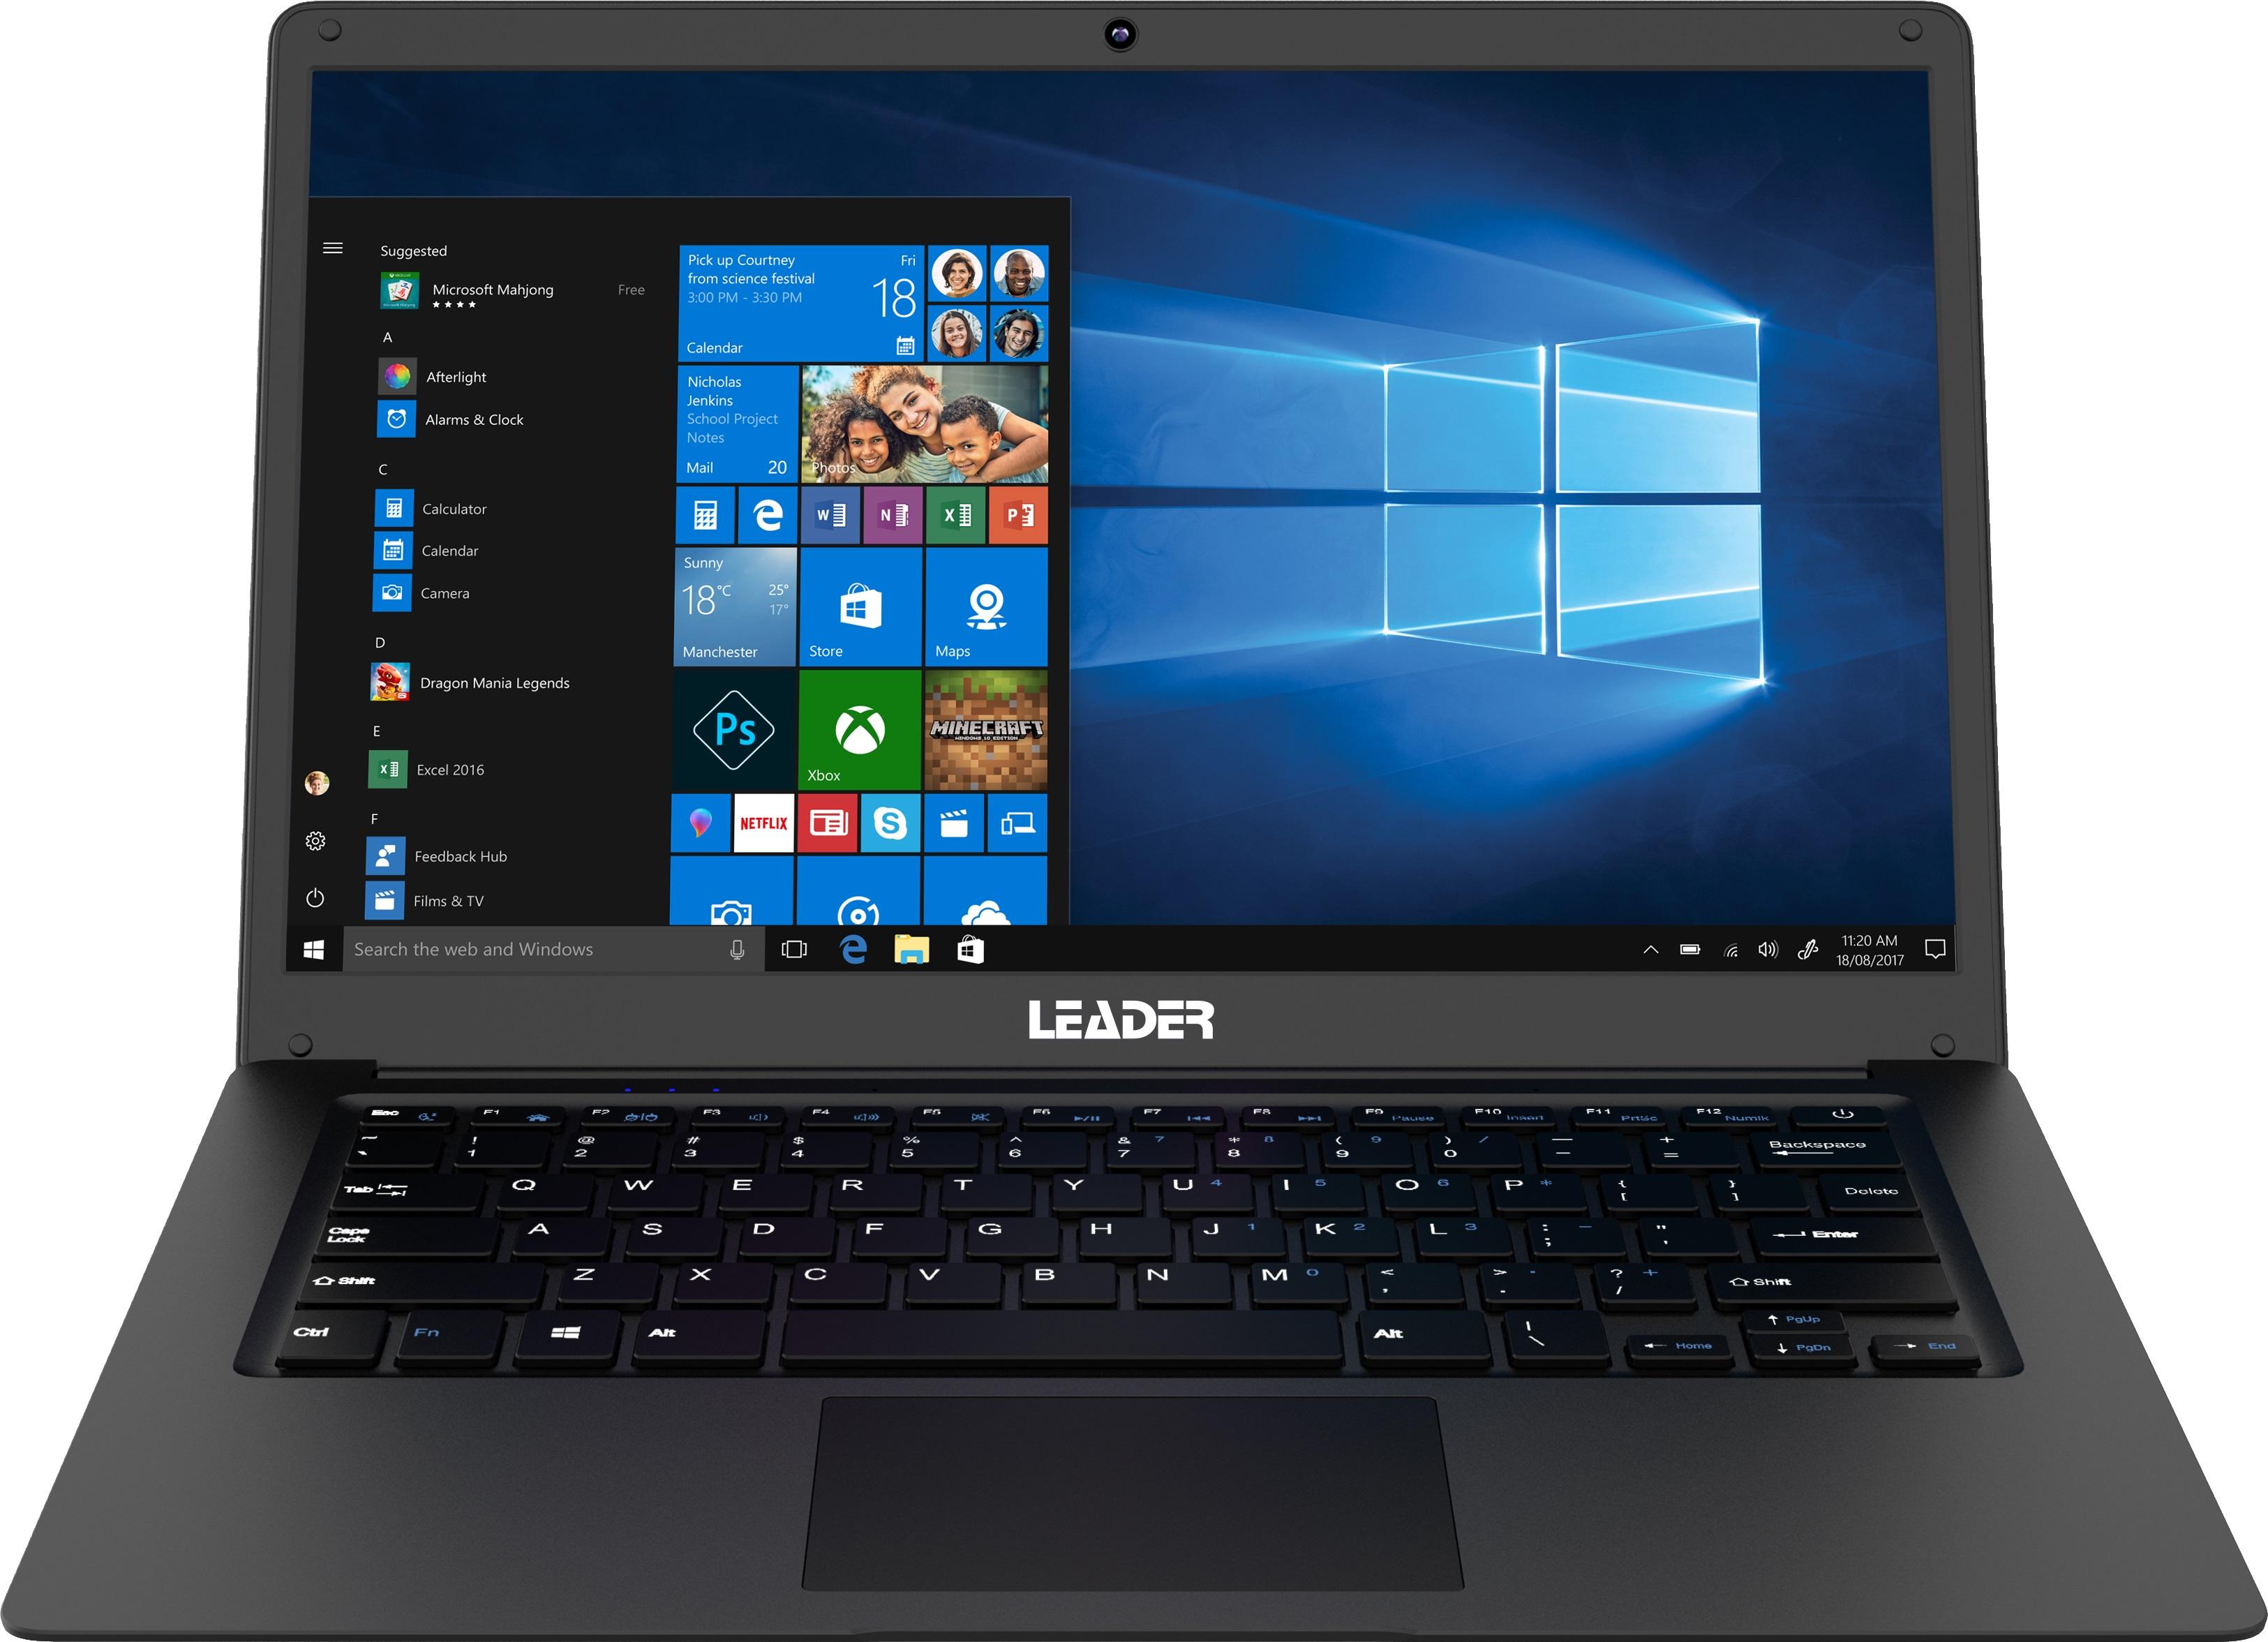 Leader Companion 408PRO Notebook, 14' Full HD, Celeron, 4GB, 64GB Storage, Windows 10 Professional, 1 Year Onsite Warranty, Webcam, W10P